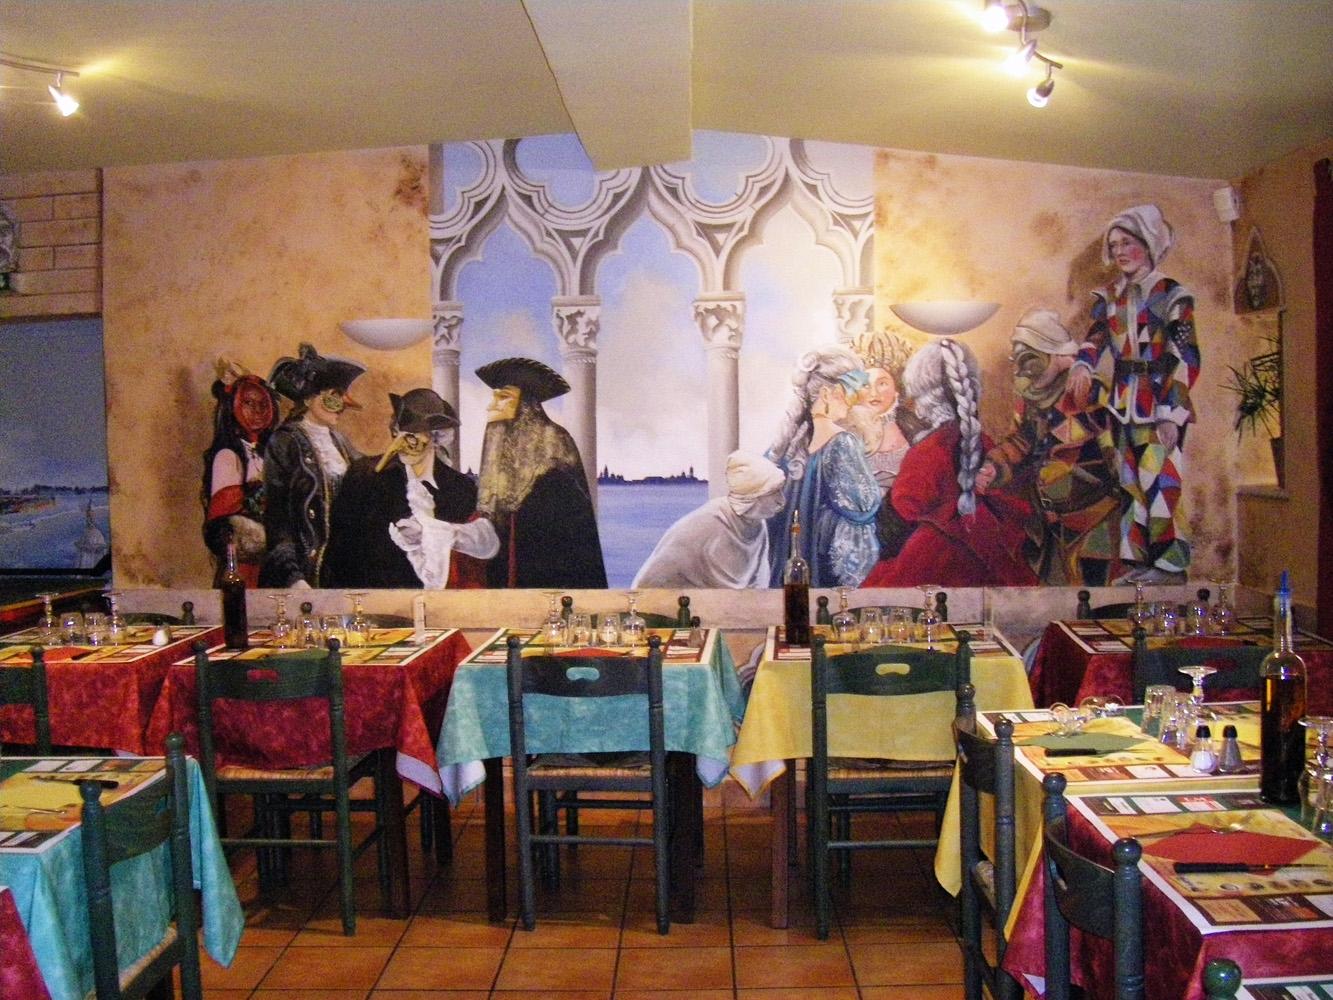 Décors restaurant Don Vito